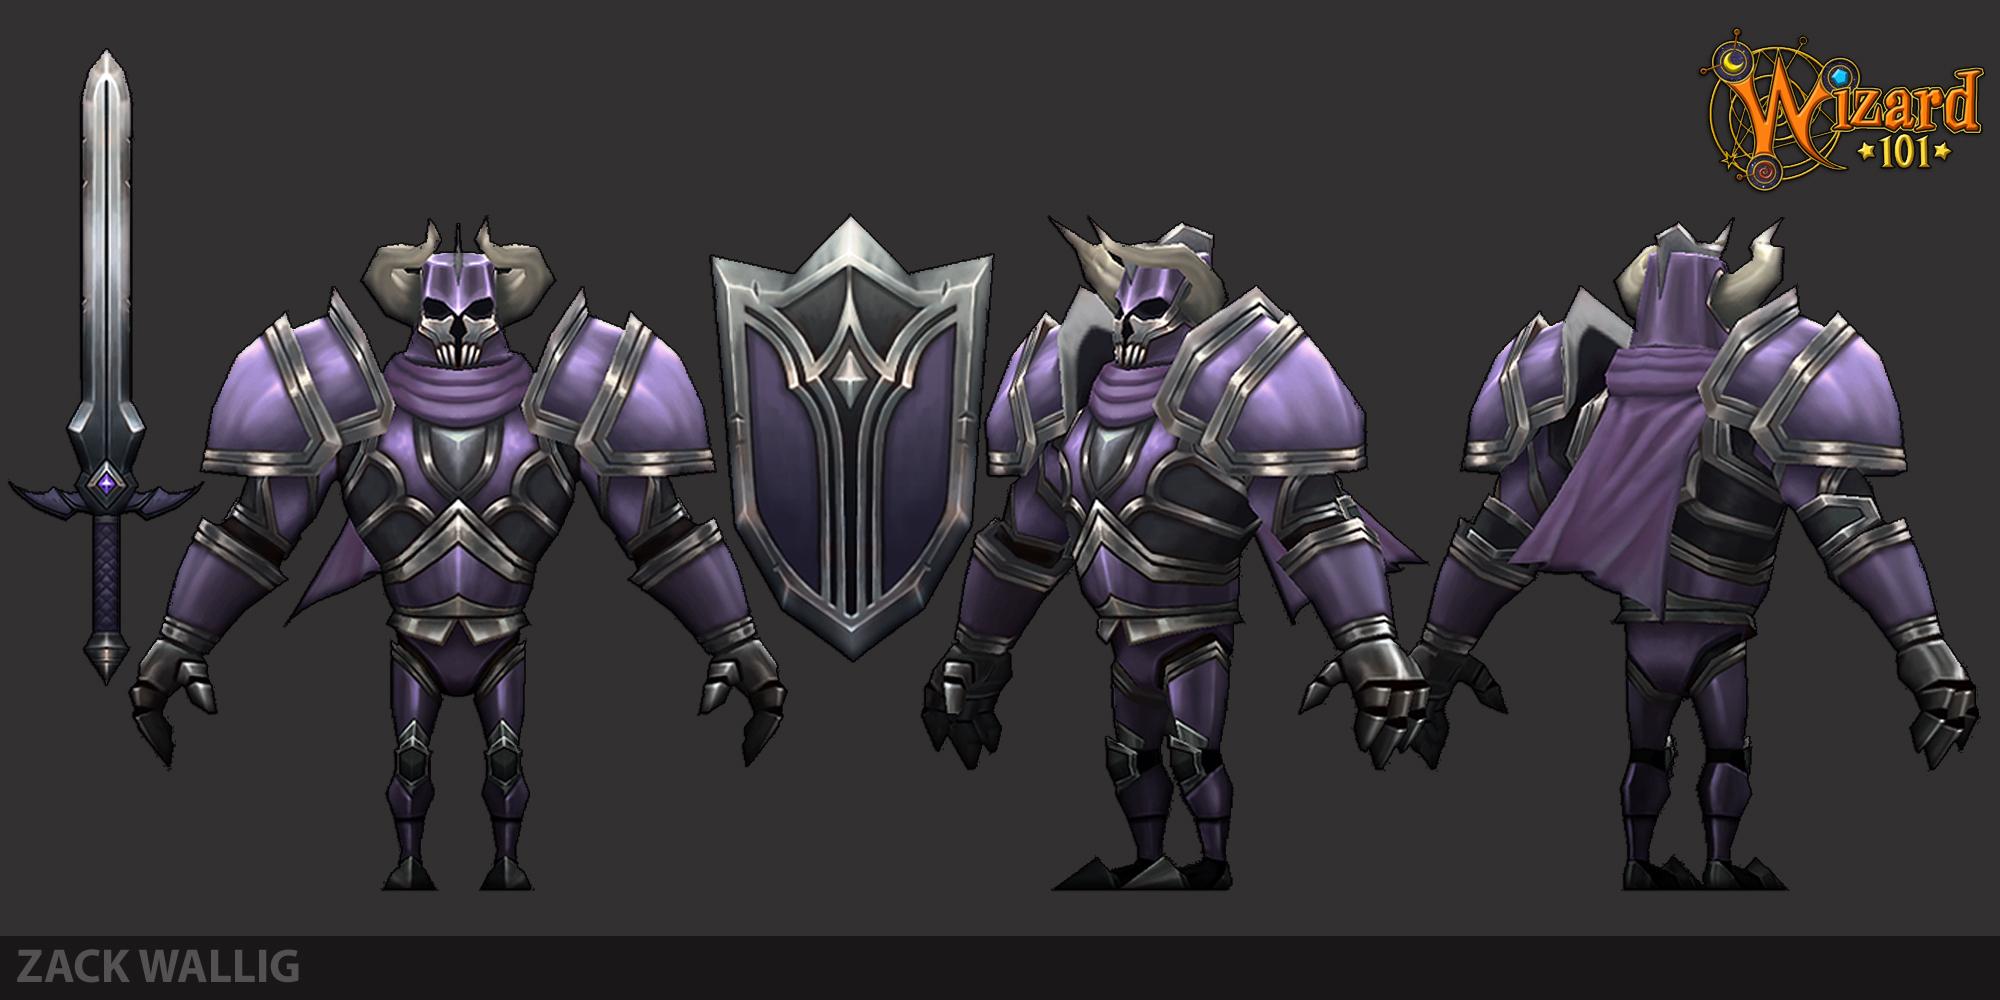 Wizard 101 enemy death knight